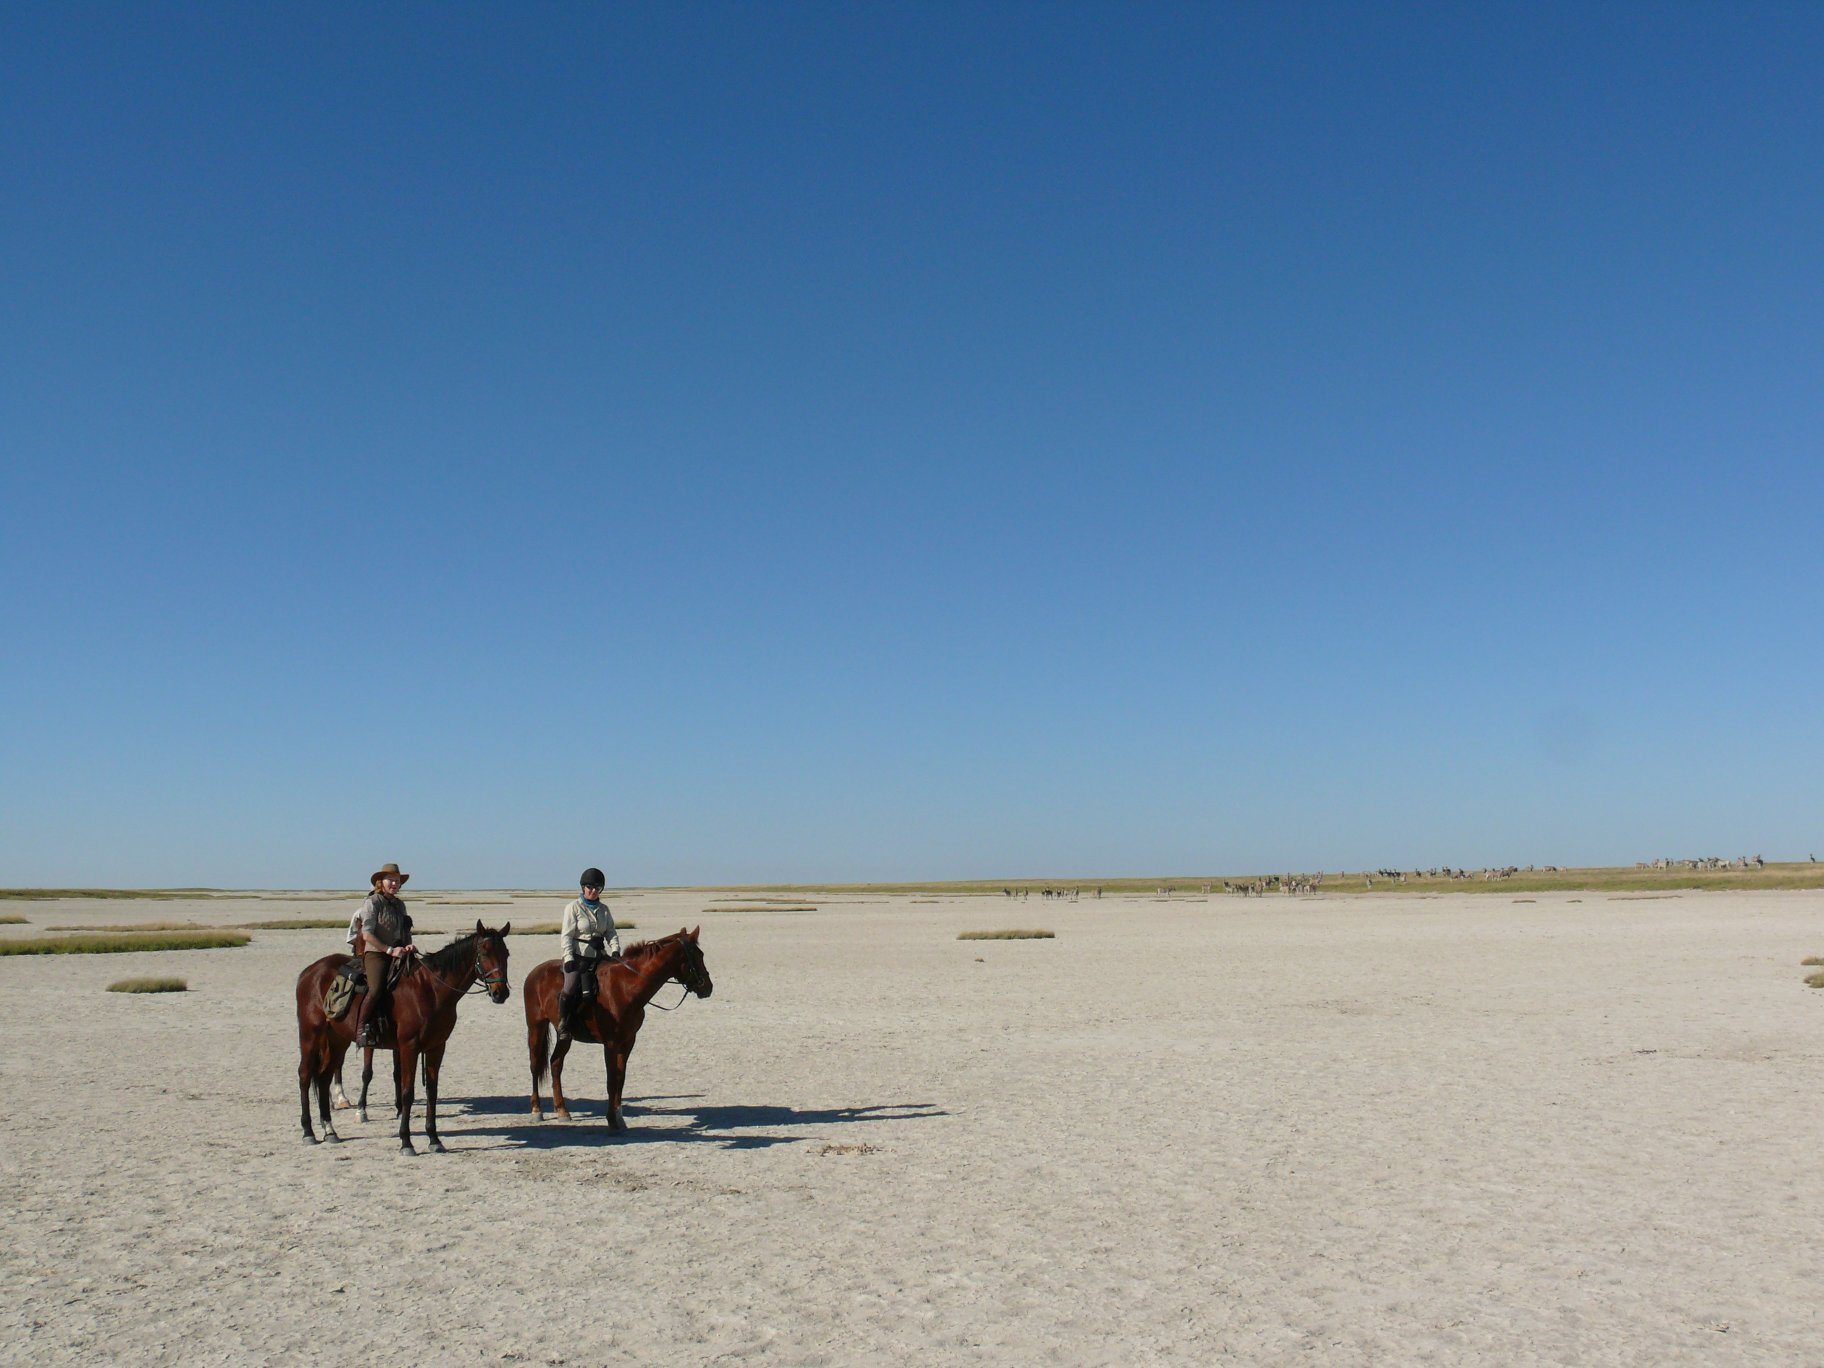 Cathy at Makgadikgadi Pans with zebra on the horizon